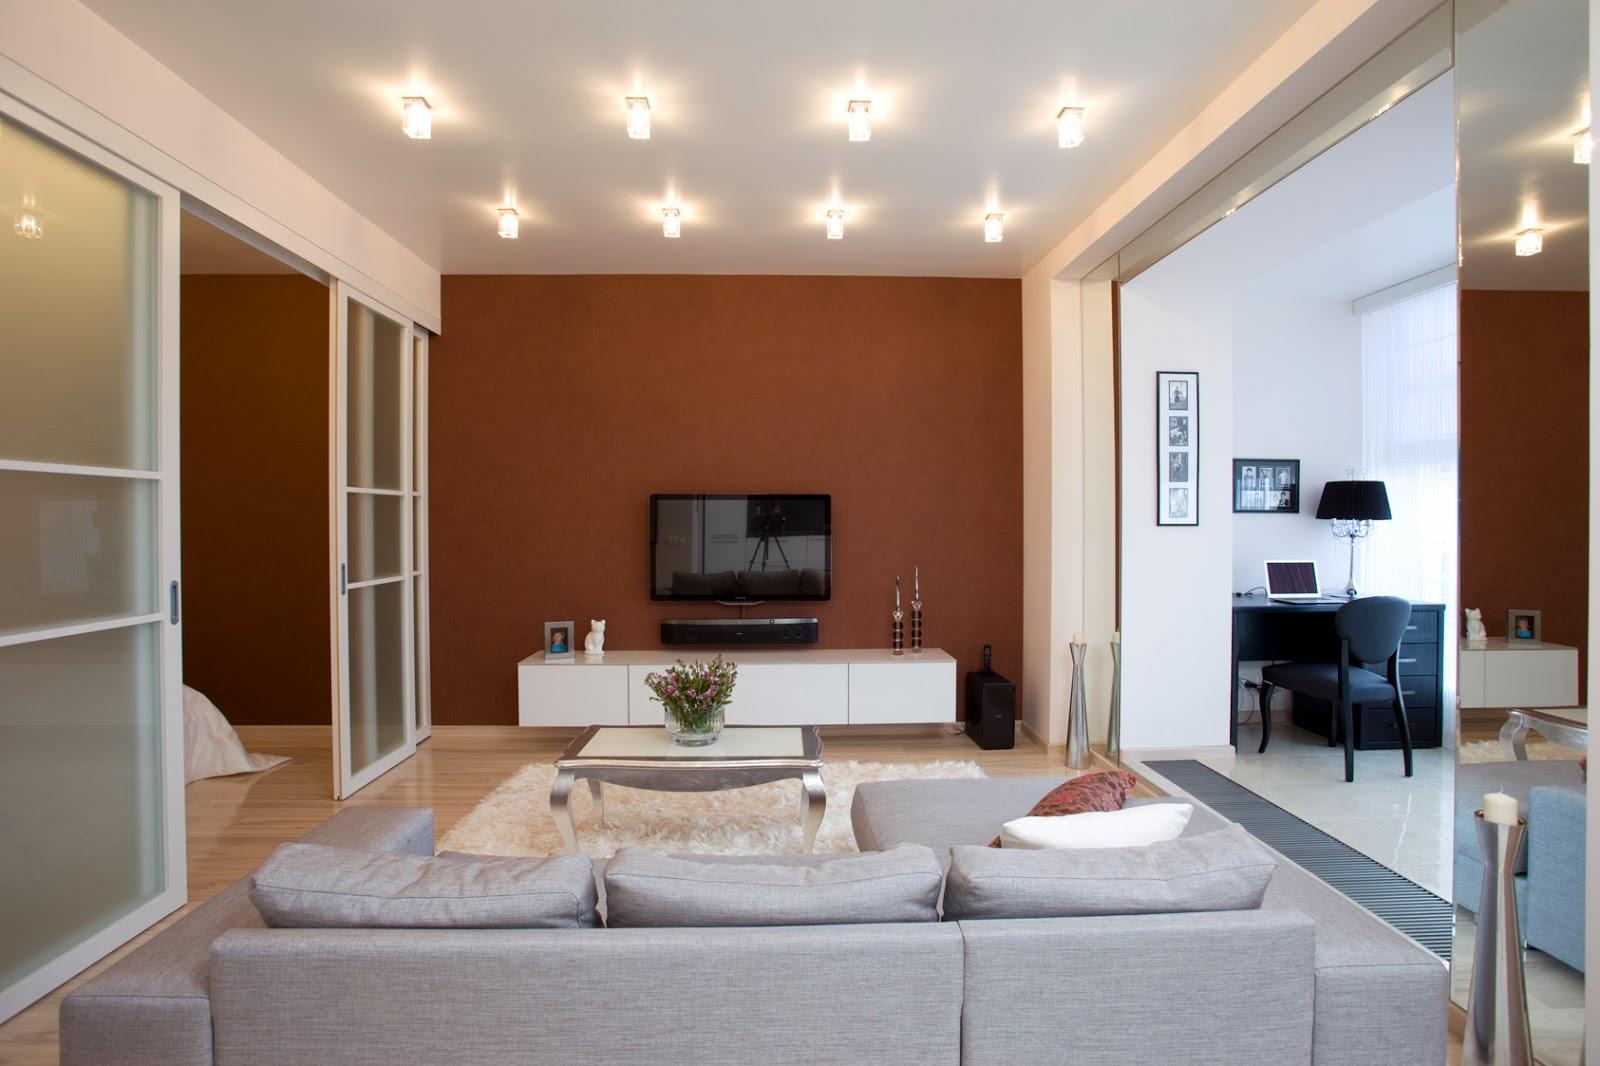 дизайна квартиры 60 кв. м 4